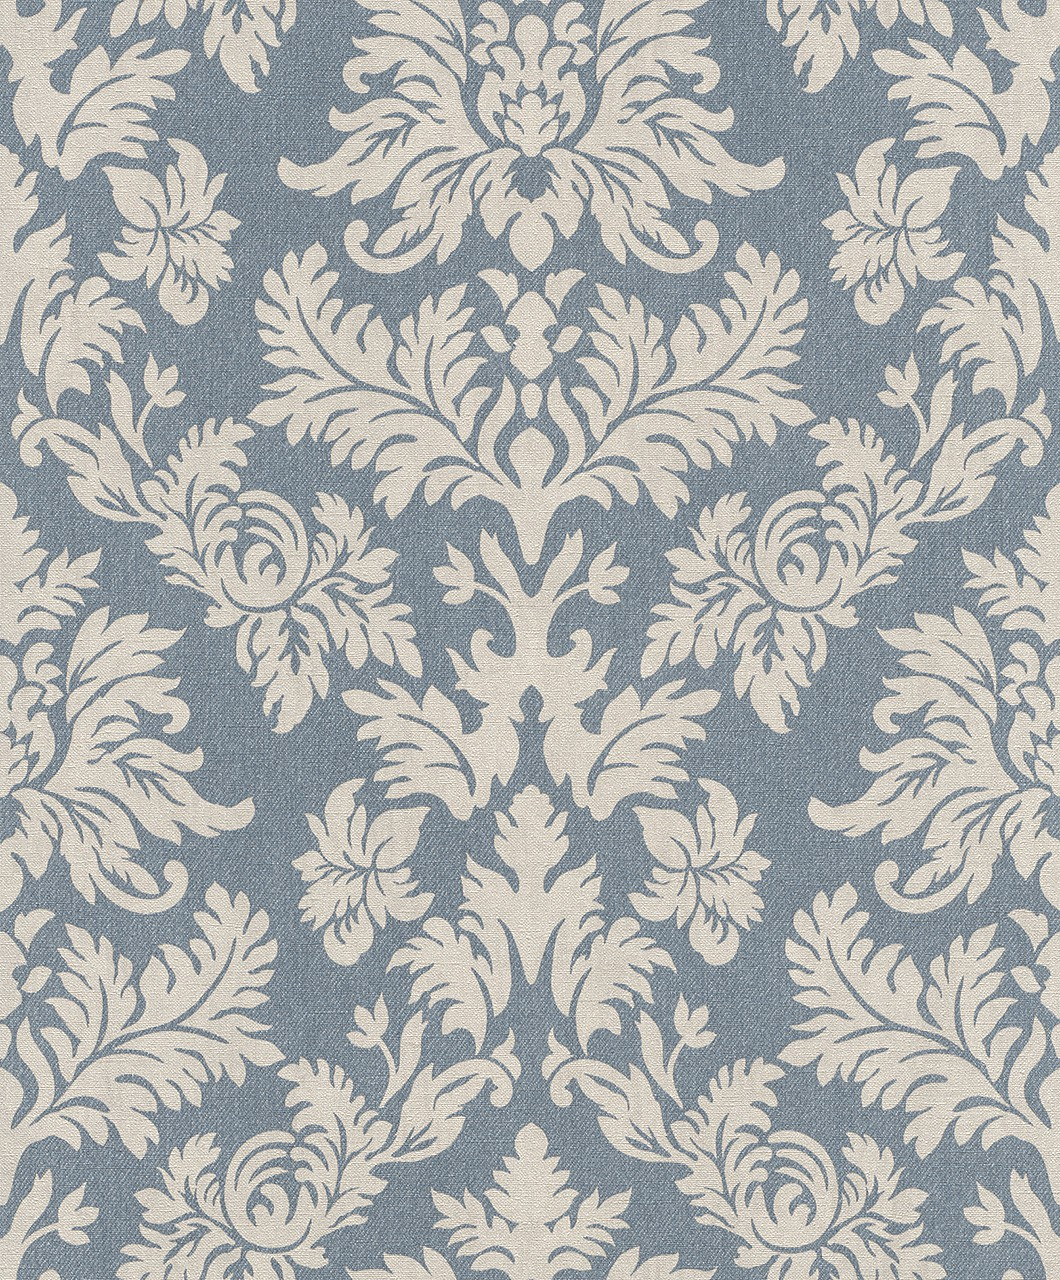 barbara becker tapete b b ornament blau 474350. Black Bedroom Furniture Sets. Home Design Ideas